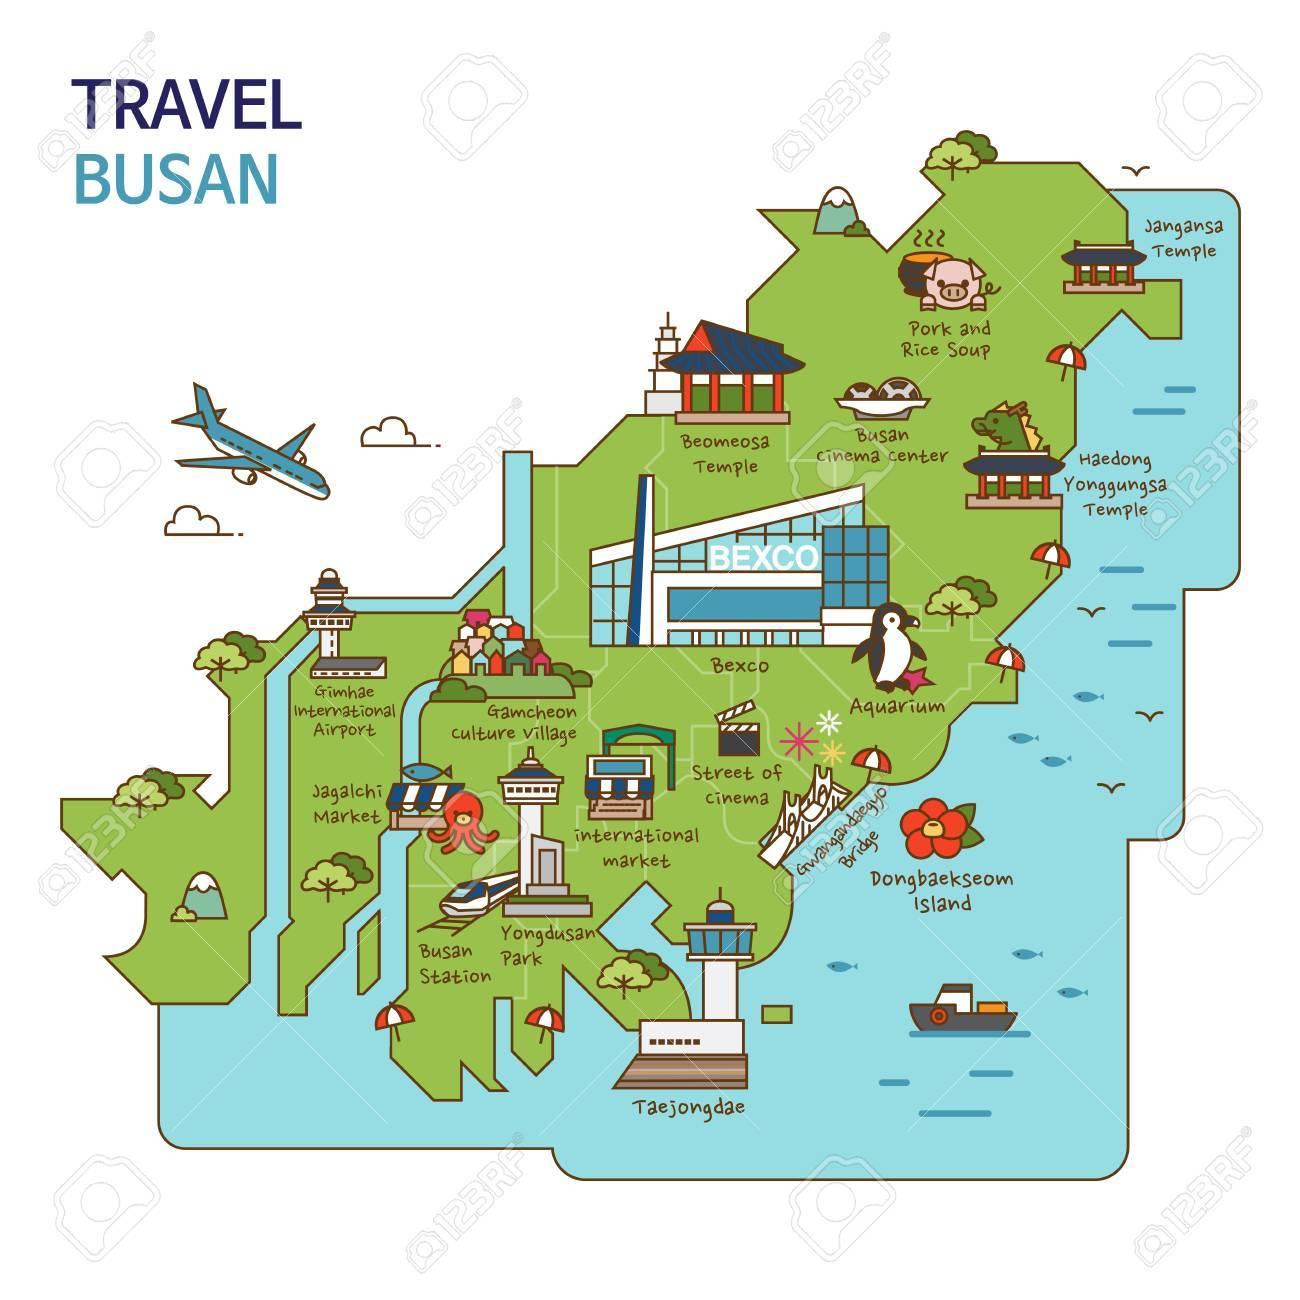 Seoul Subway Map Vector.City Tour Travel Map Illustration Busan Pusan City South Korea